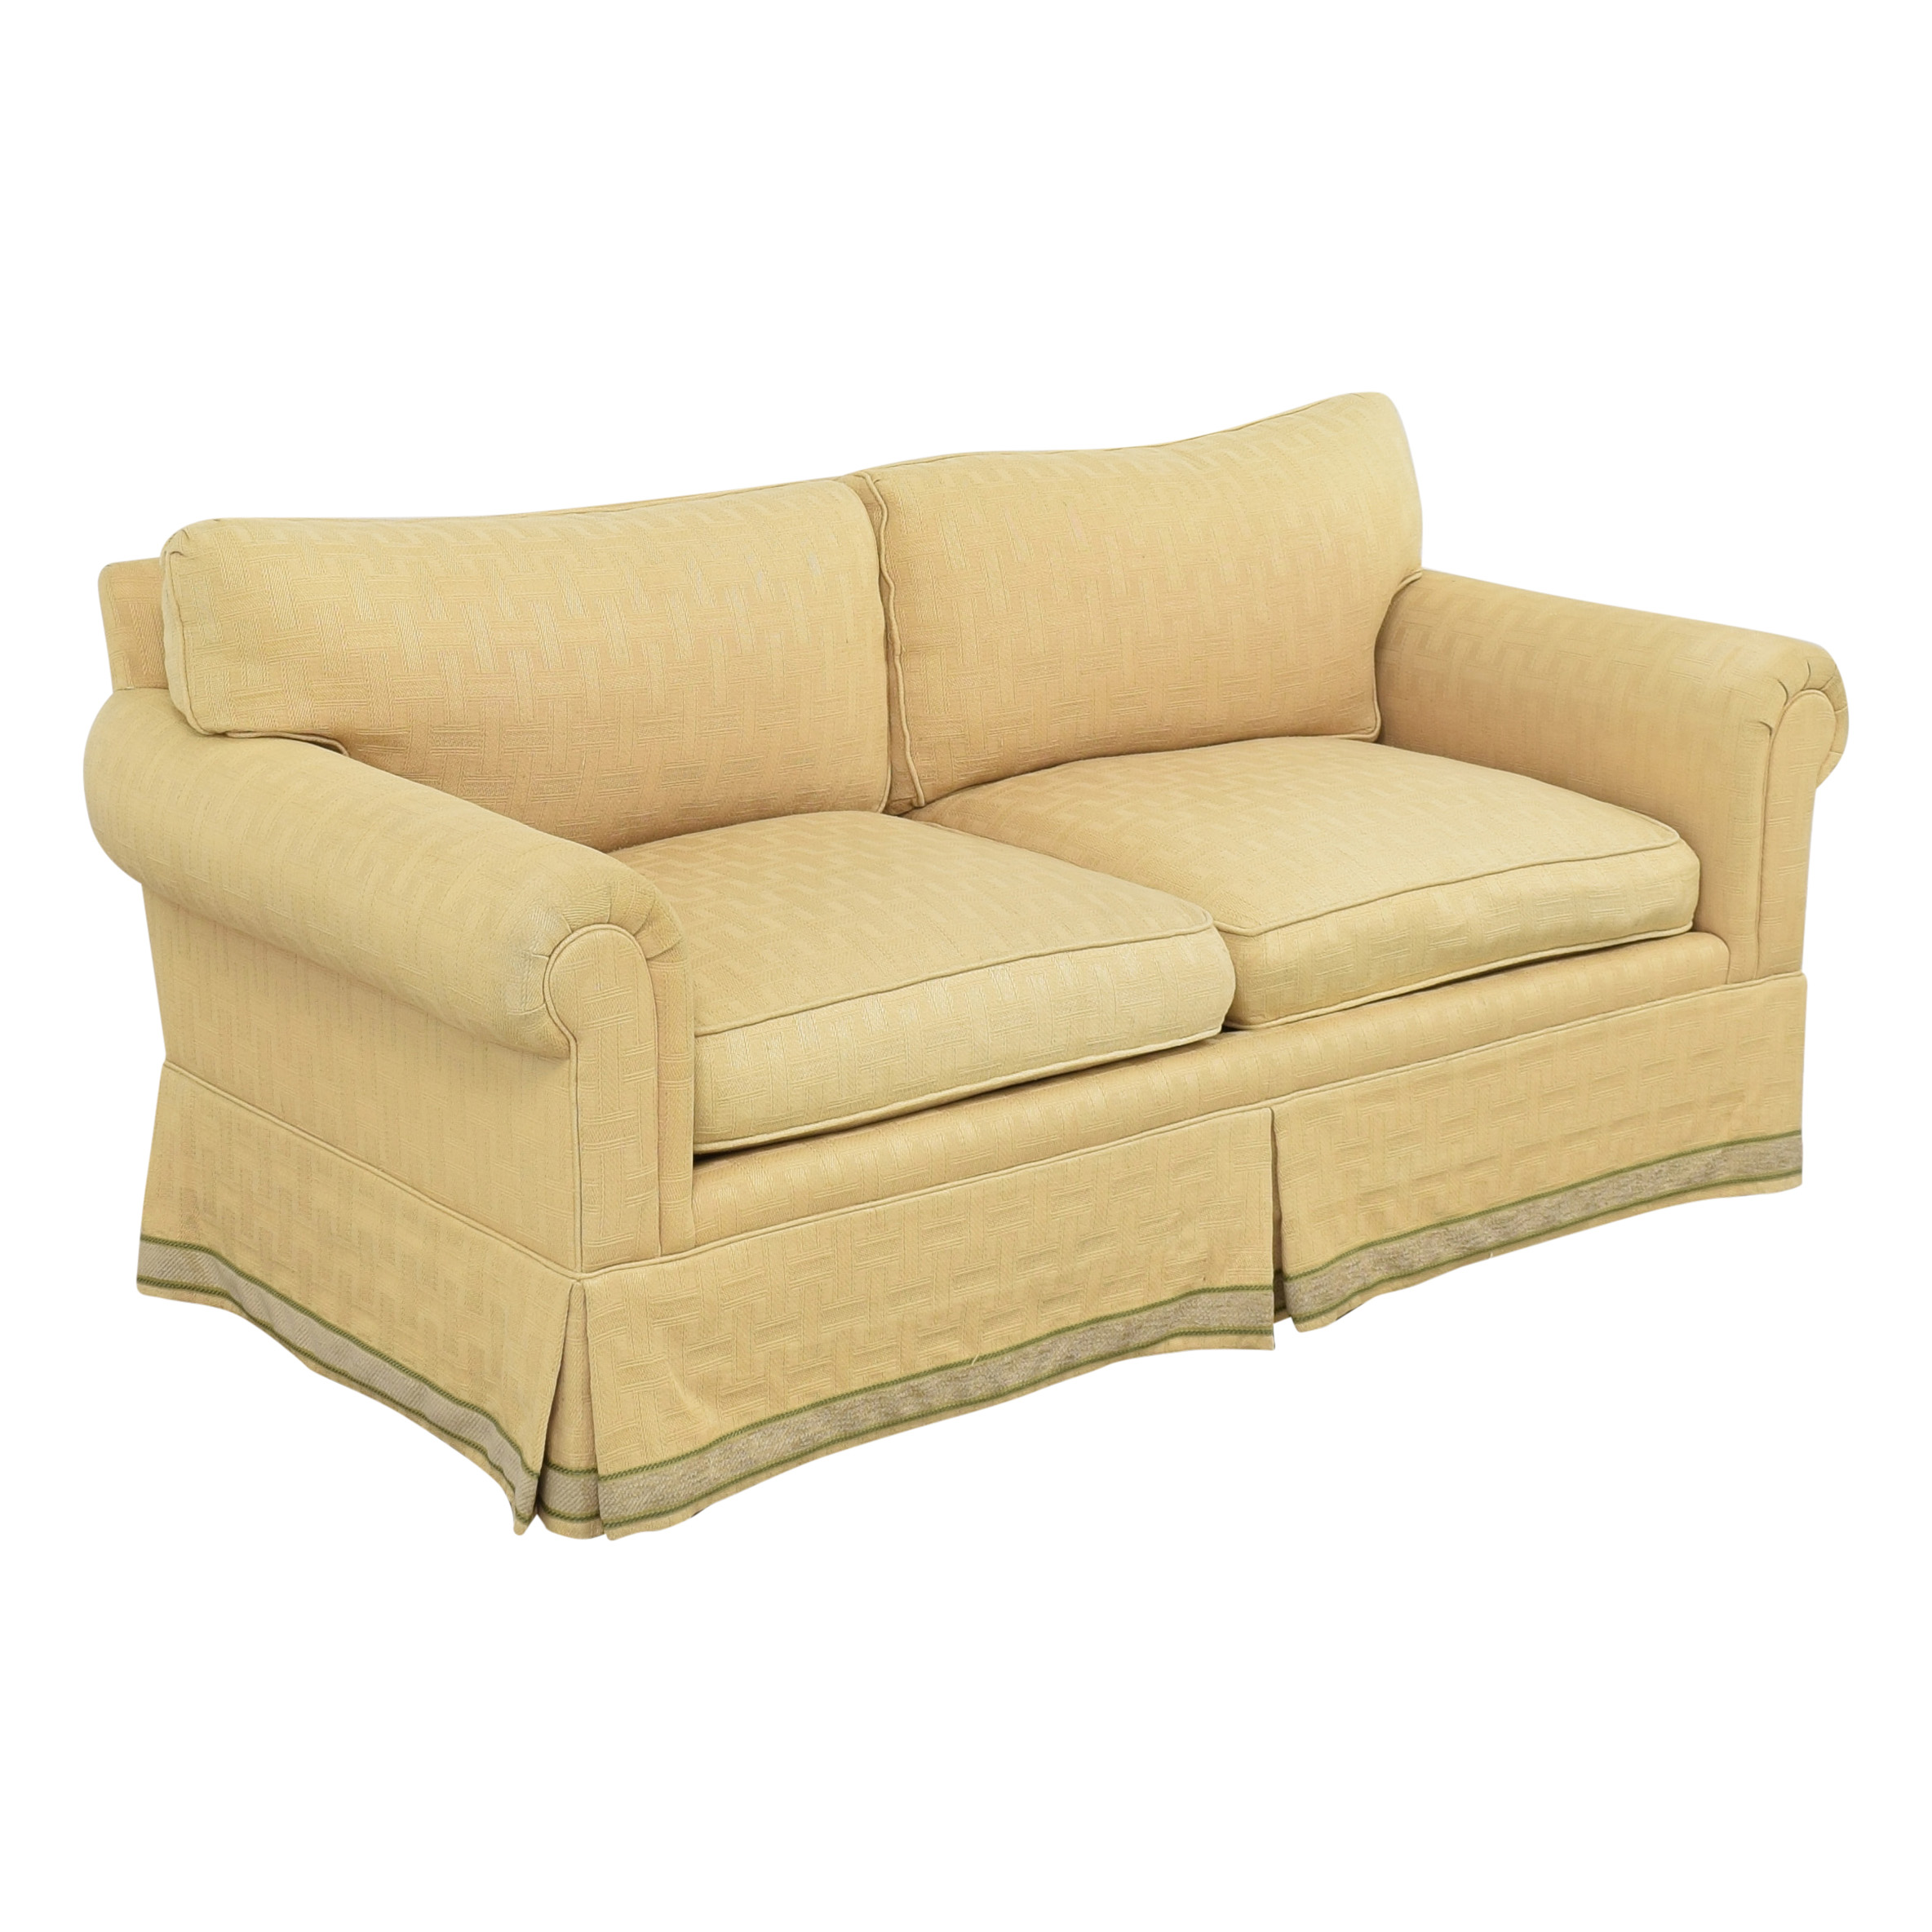 Jules Rist Jules Rist Signature Roll Arm Two Cushion Sofa ct